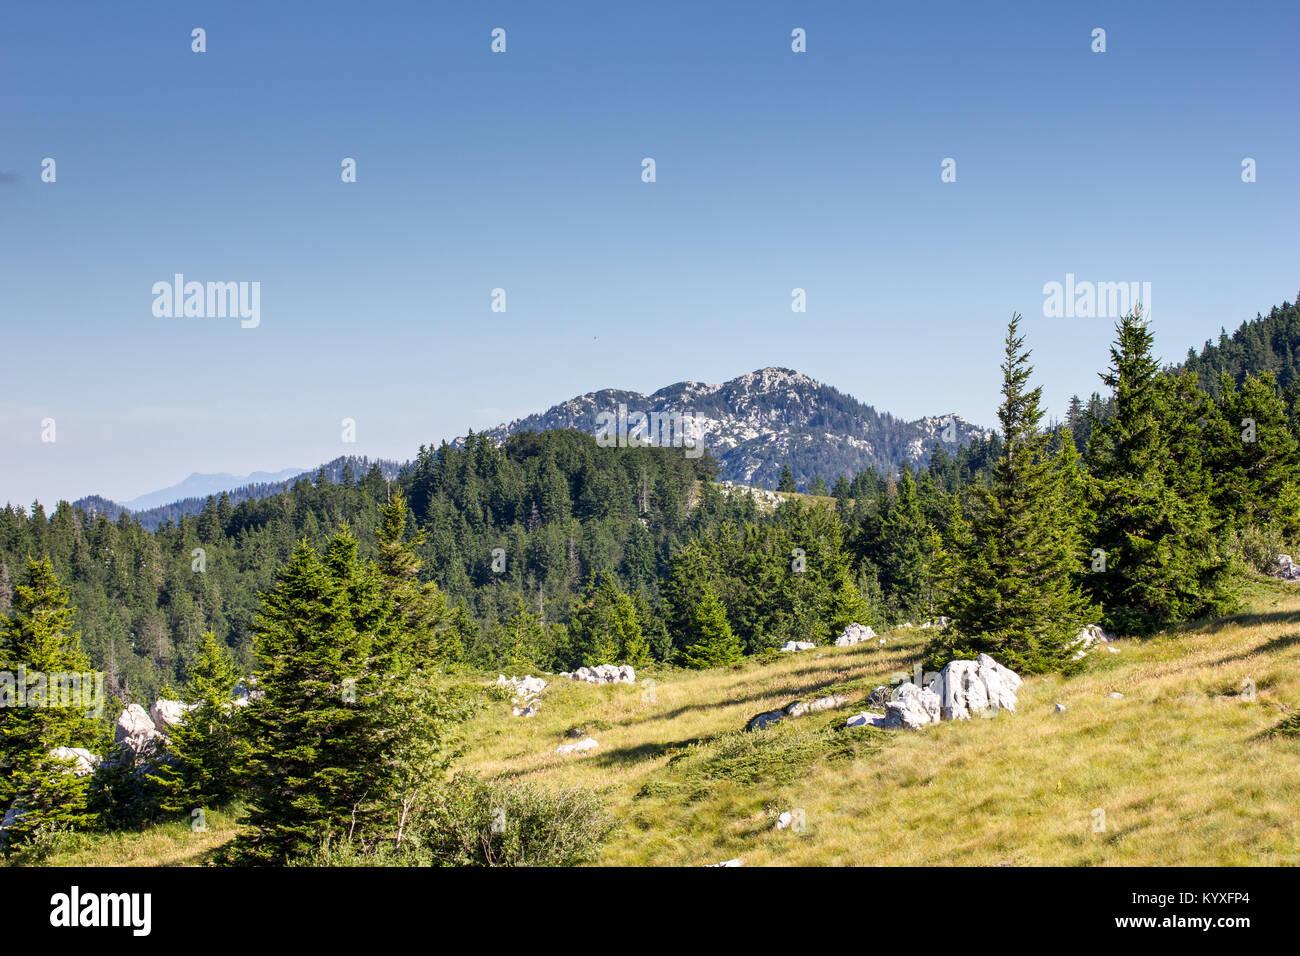 Velebit mountain peaks Zavizan - Northern Velebit National Park, Croatia -  Aug 2016 Stock Photo